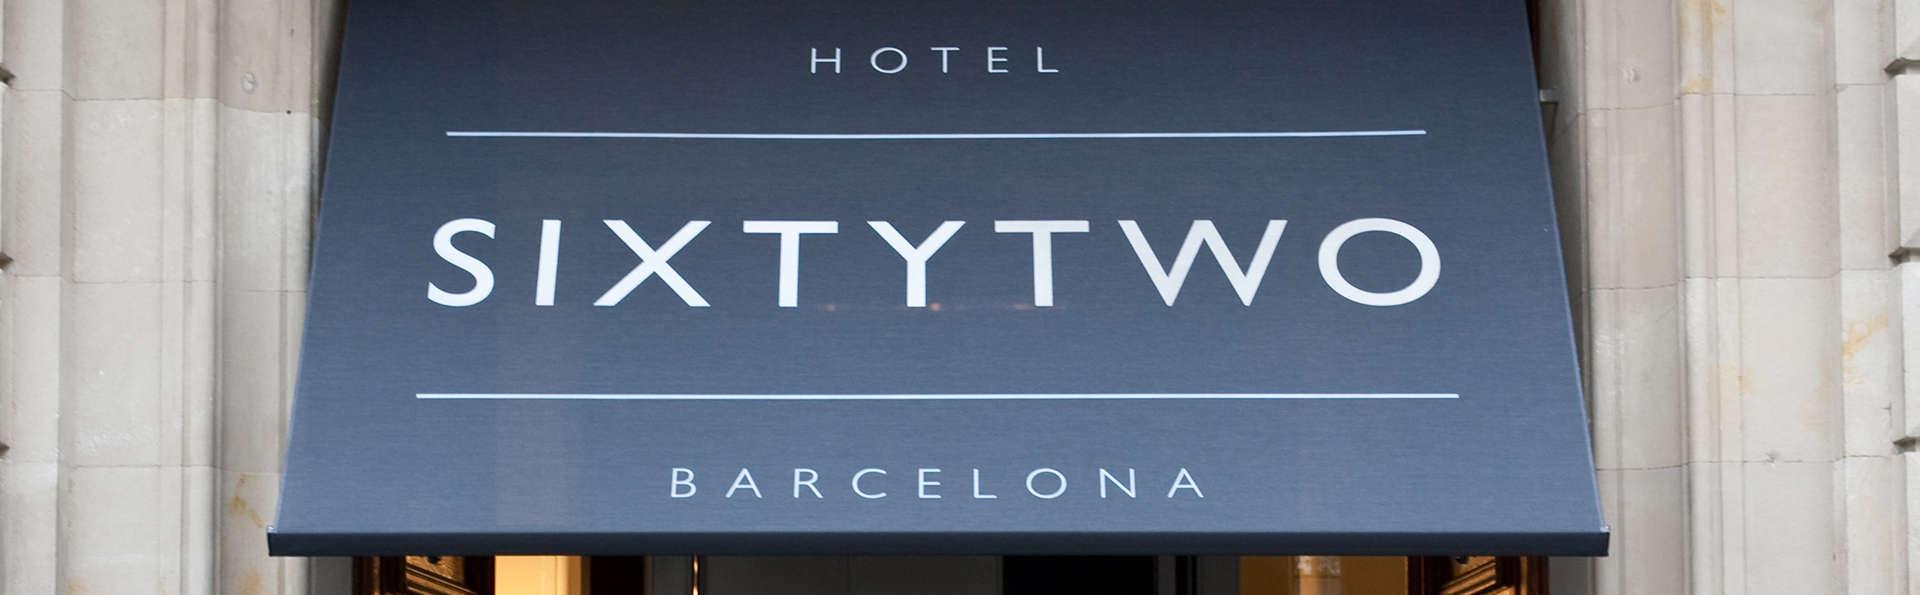 Sixtytwo Barcelona - edit_front.jpg